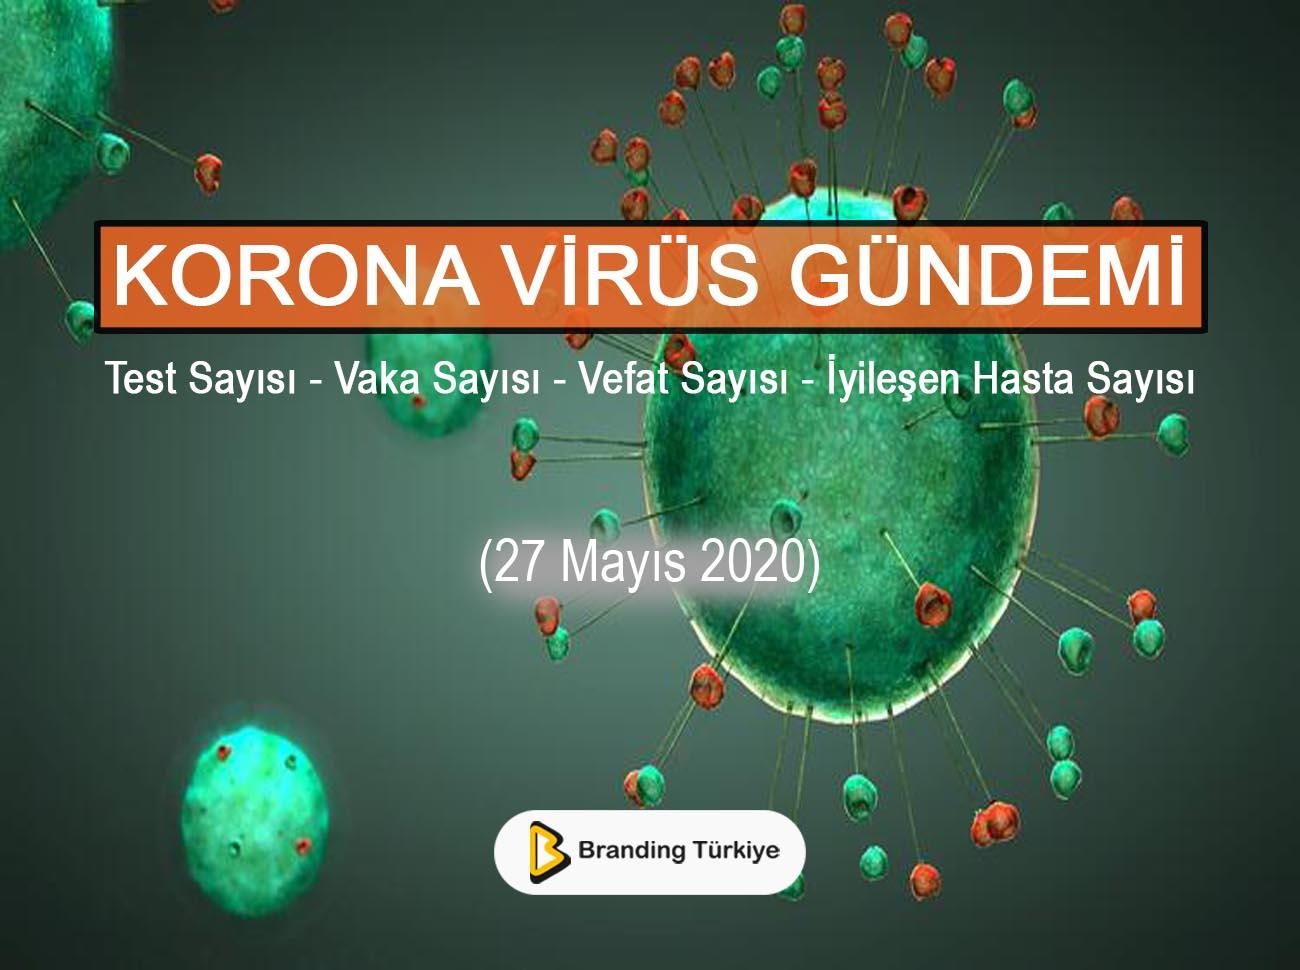 Korona Virüs Gündemi (27 Mayıs 2020)